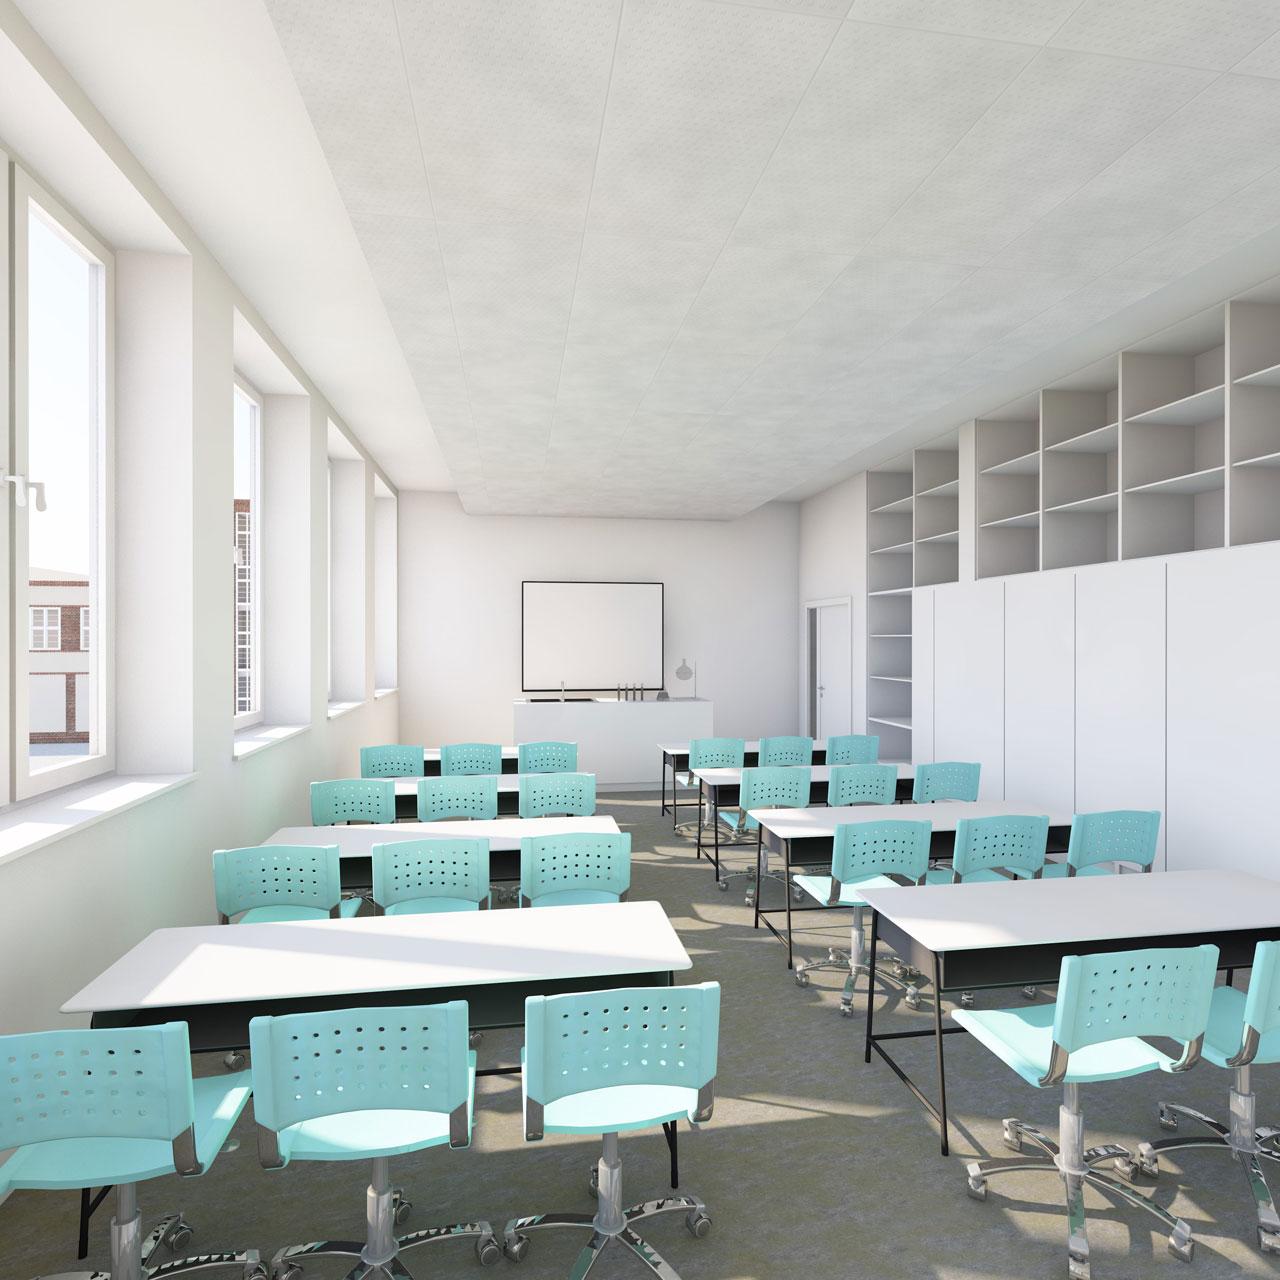 Perspektive Klassenzimmer